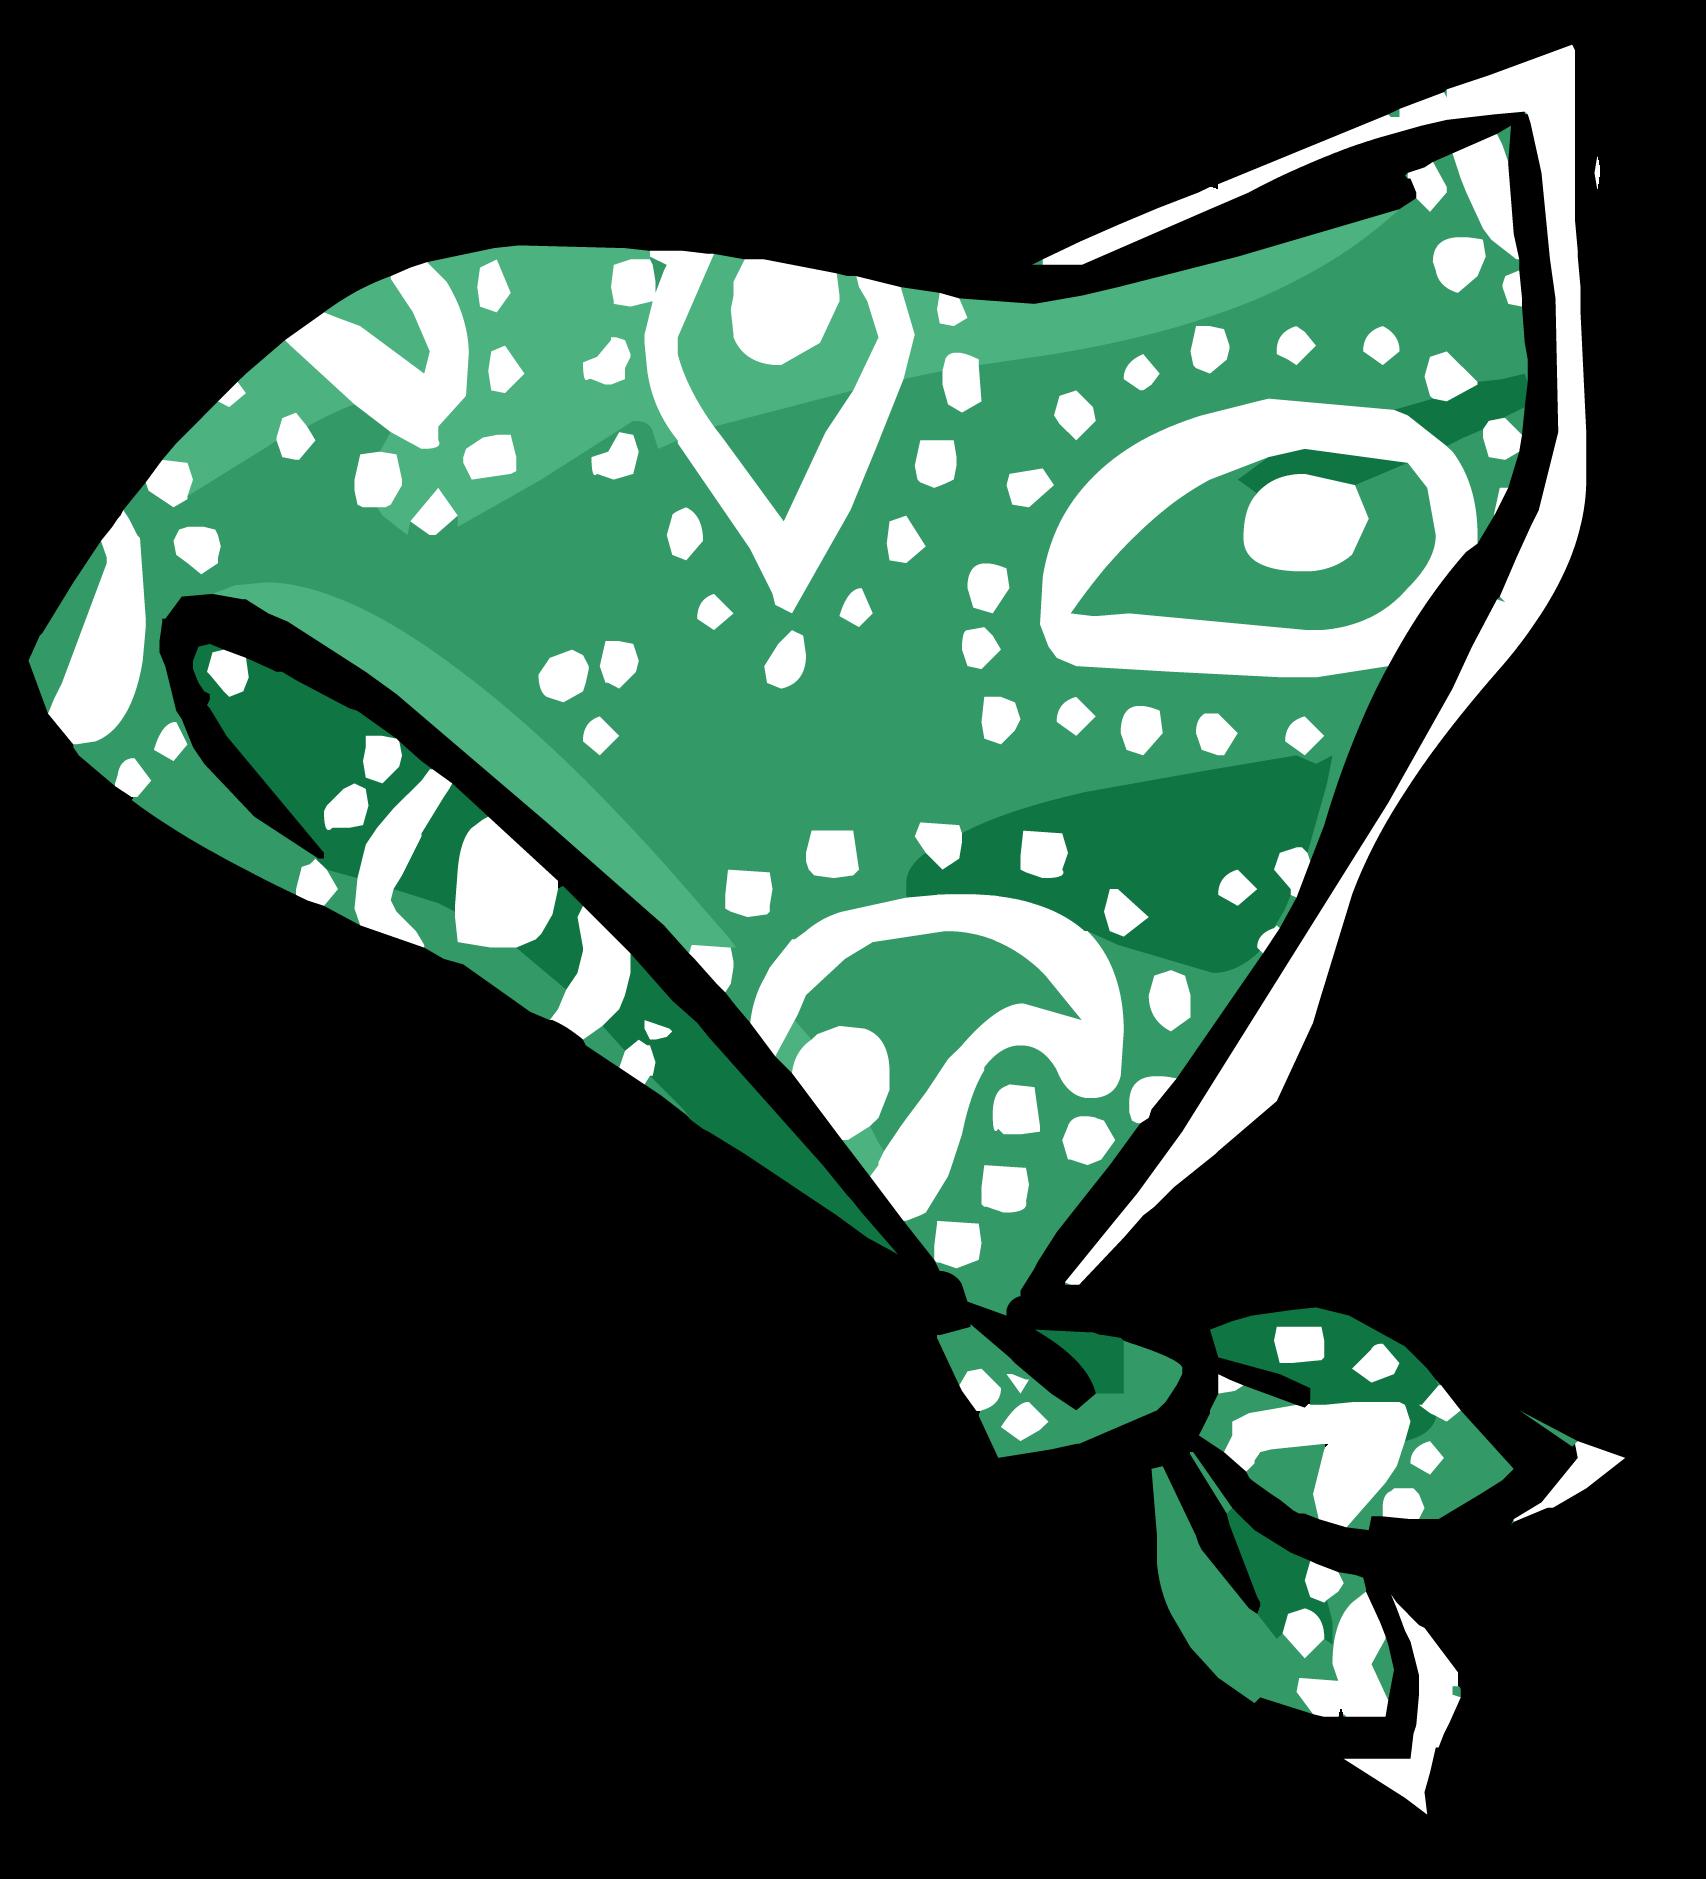 Bandana clipart green bandana. Paisley club penguin rewritten